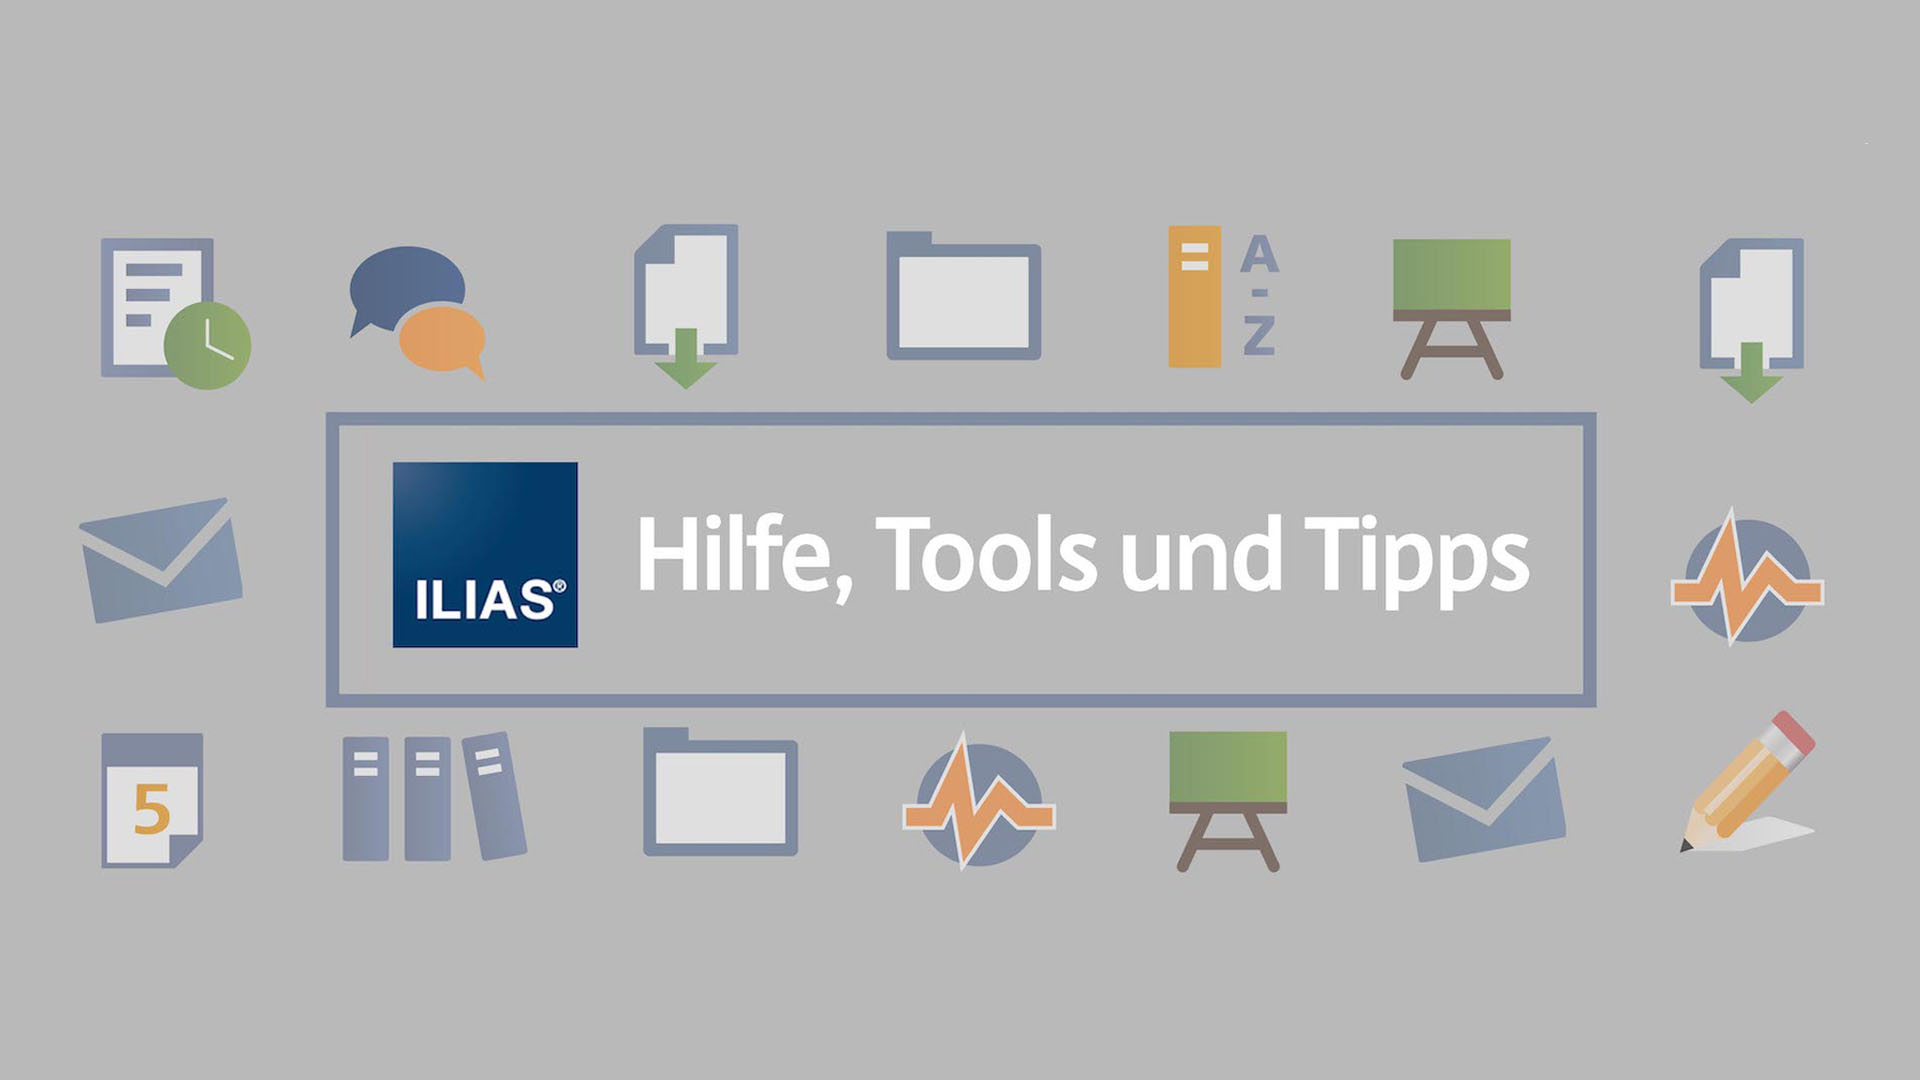 ILIAS-Online-Hilfe